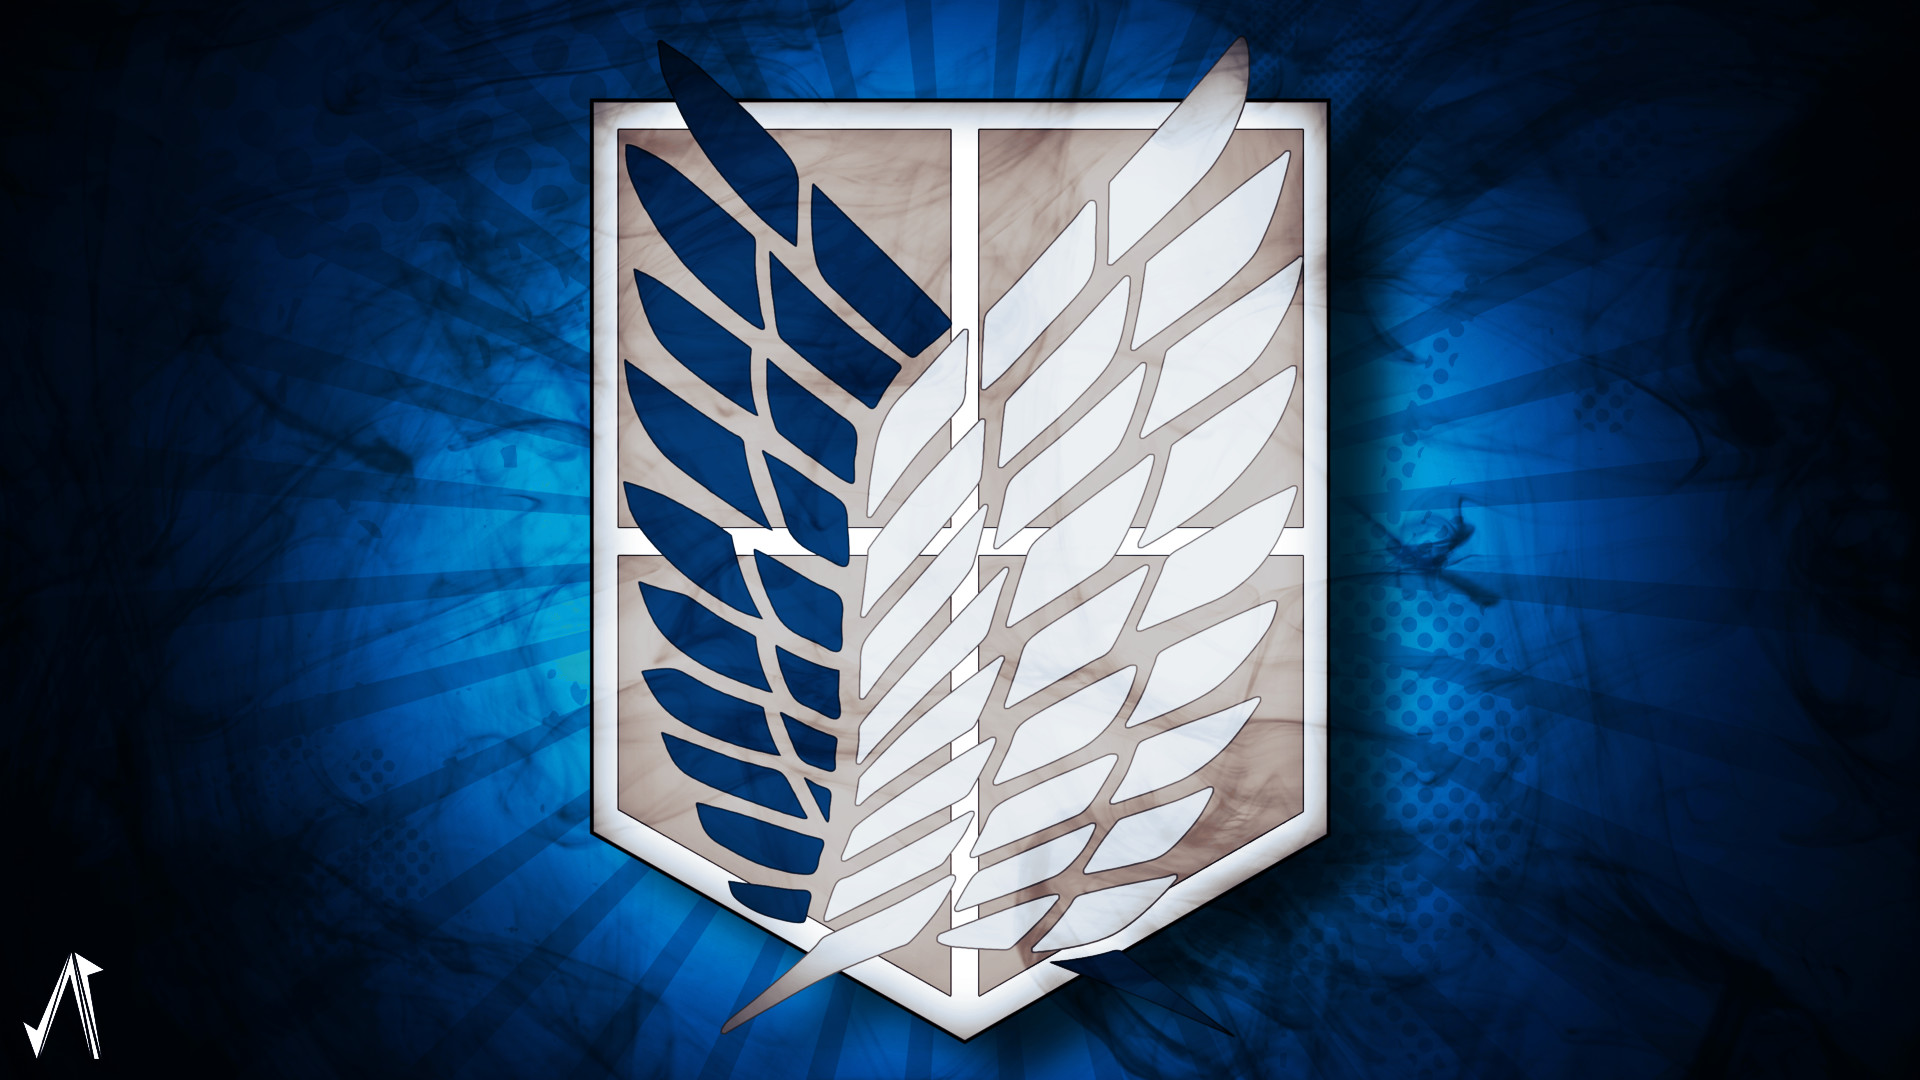 Wings of Freedom Wallpapers – WallpaperSafari Attack On Titan Wallpaper Hd Scouting  Legion